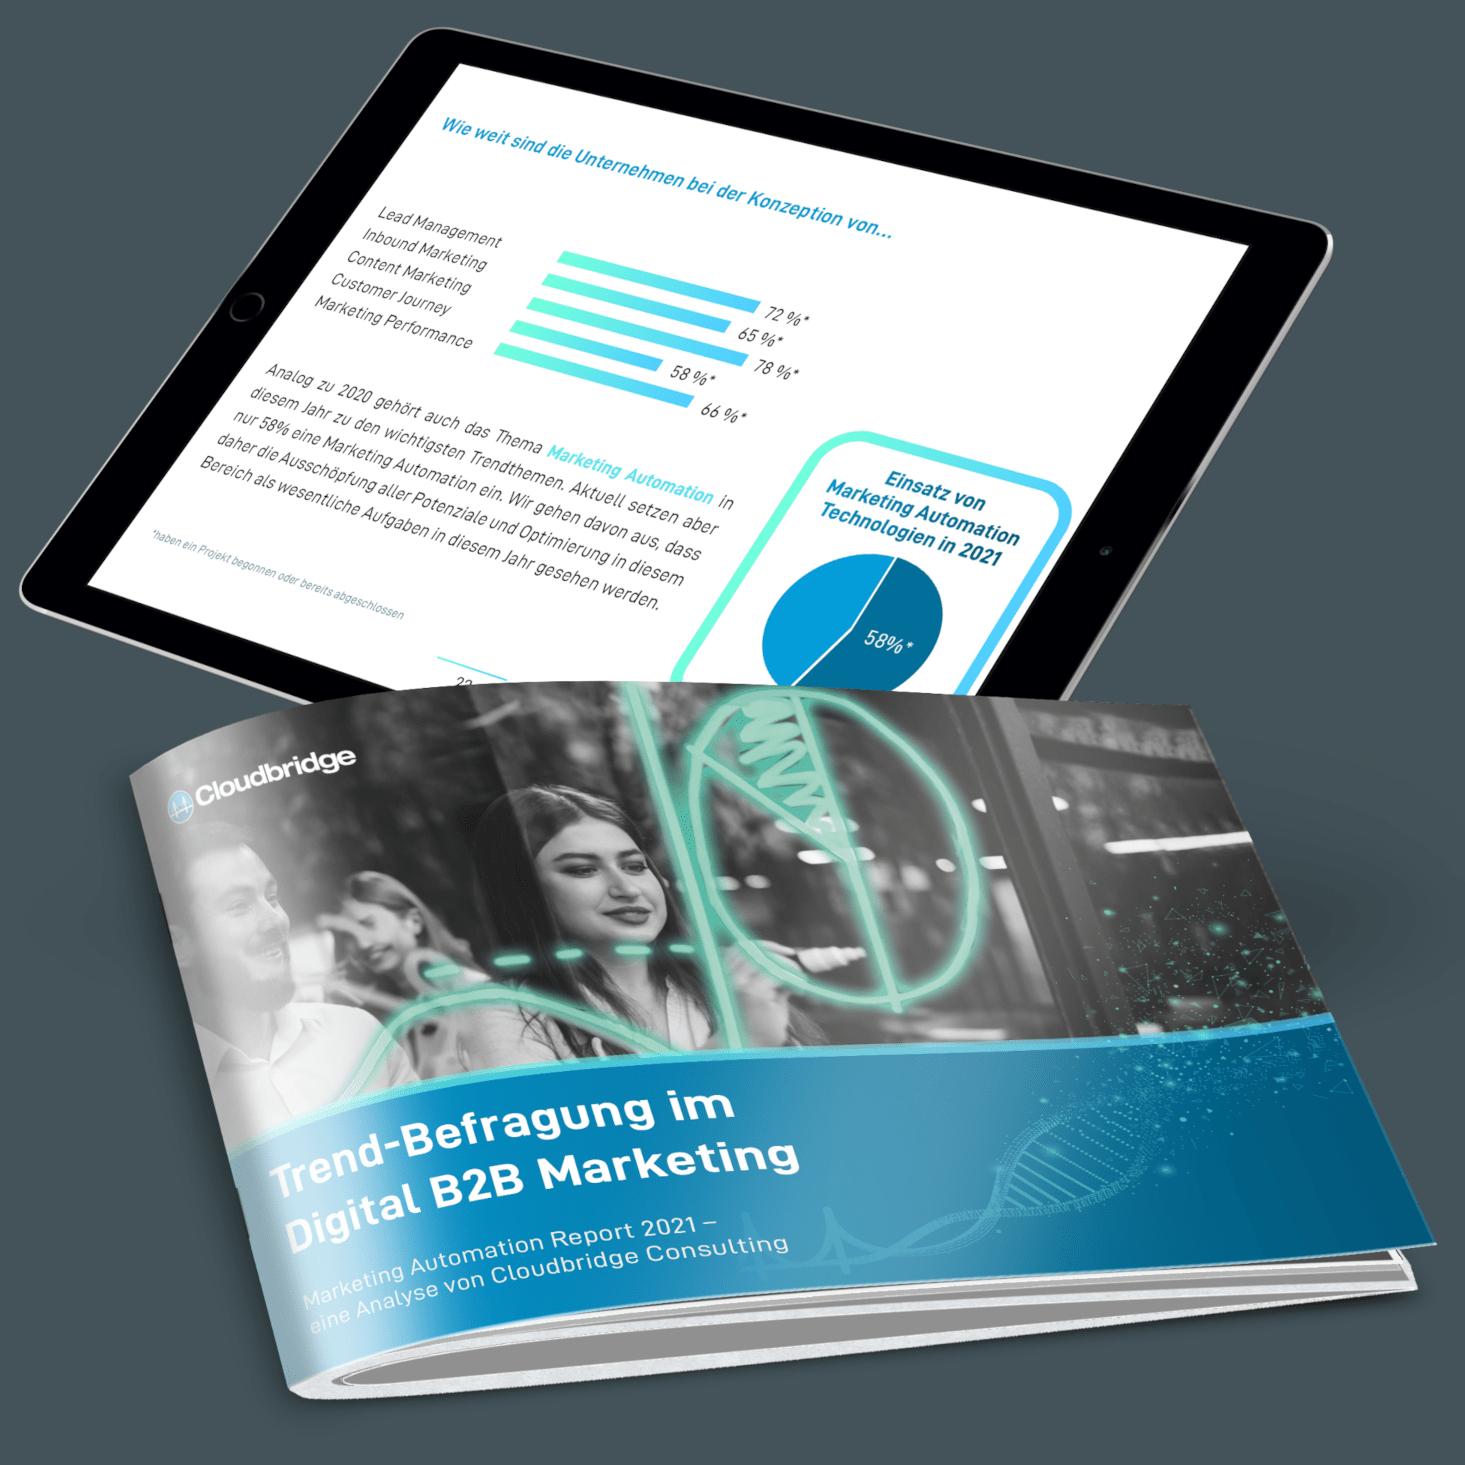 Marketing Automation Report 2021